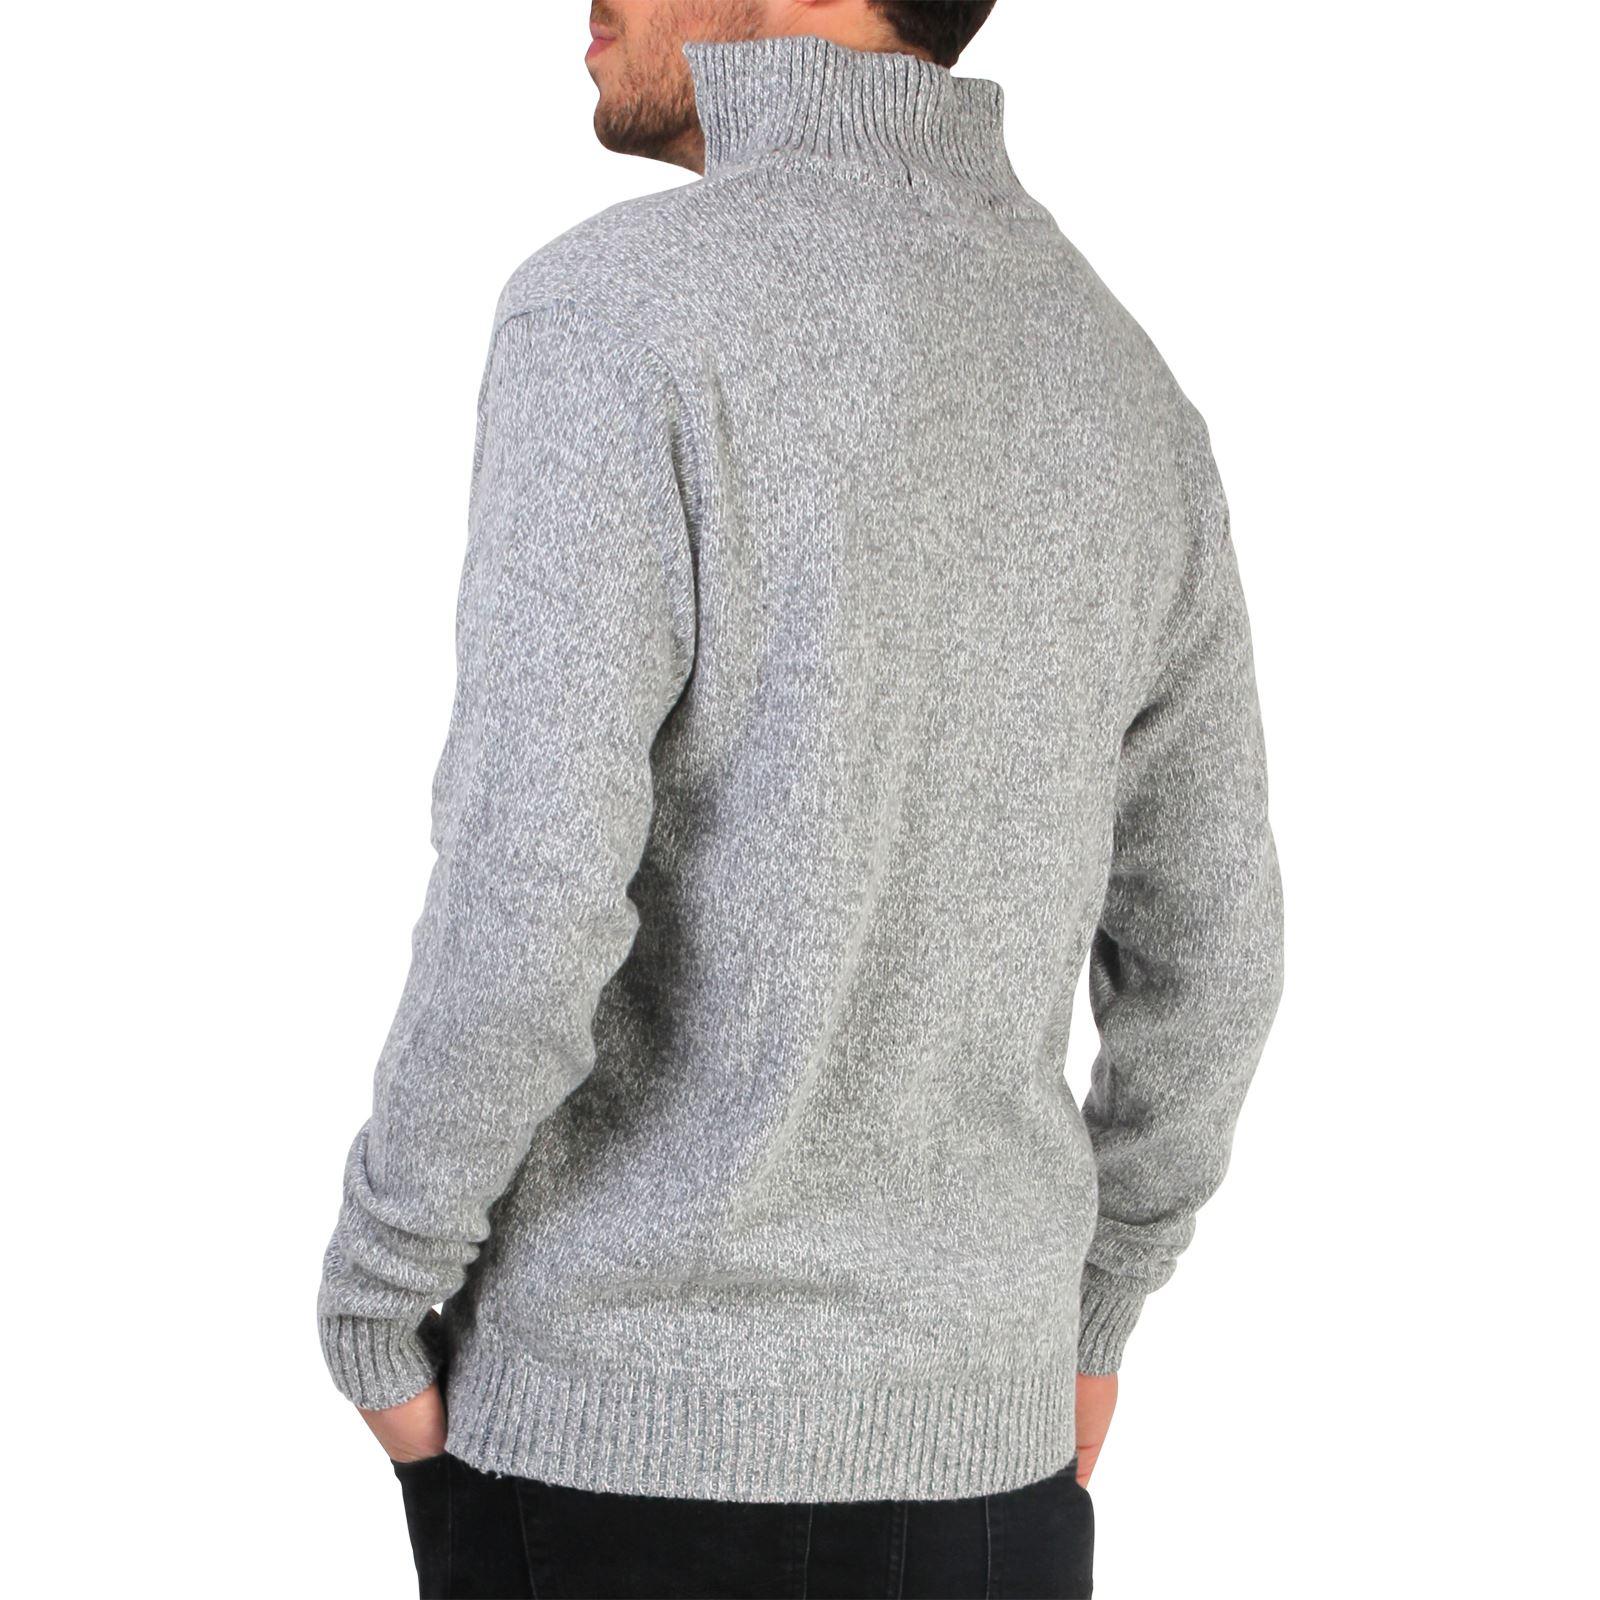 Mens-Wool-Jumper-Winter-Sweater-Zip-Up-Funnel-Neck-Soft-Knit-Cardigan-Top thumbnail 10